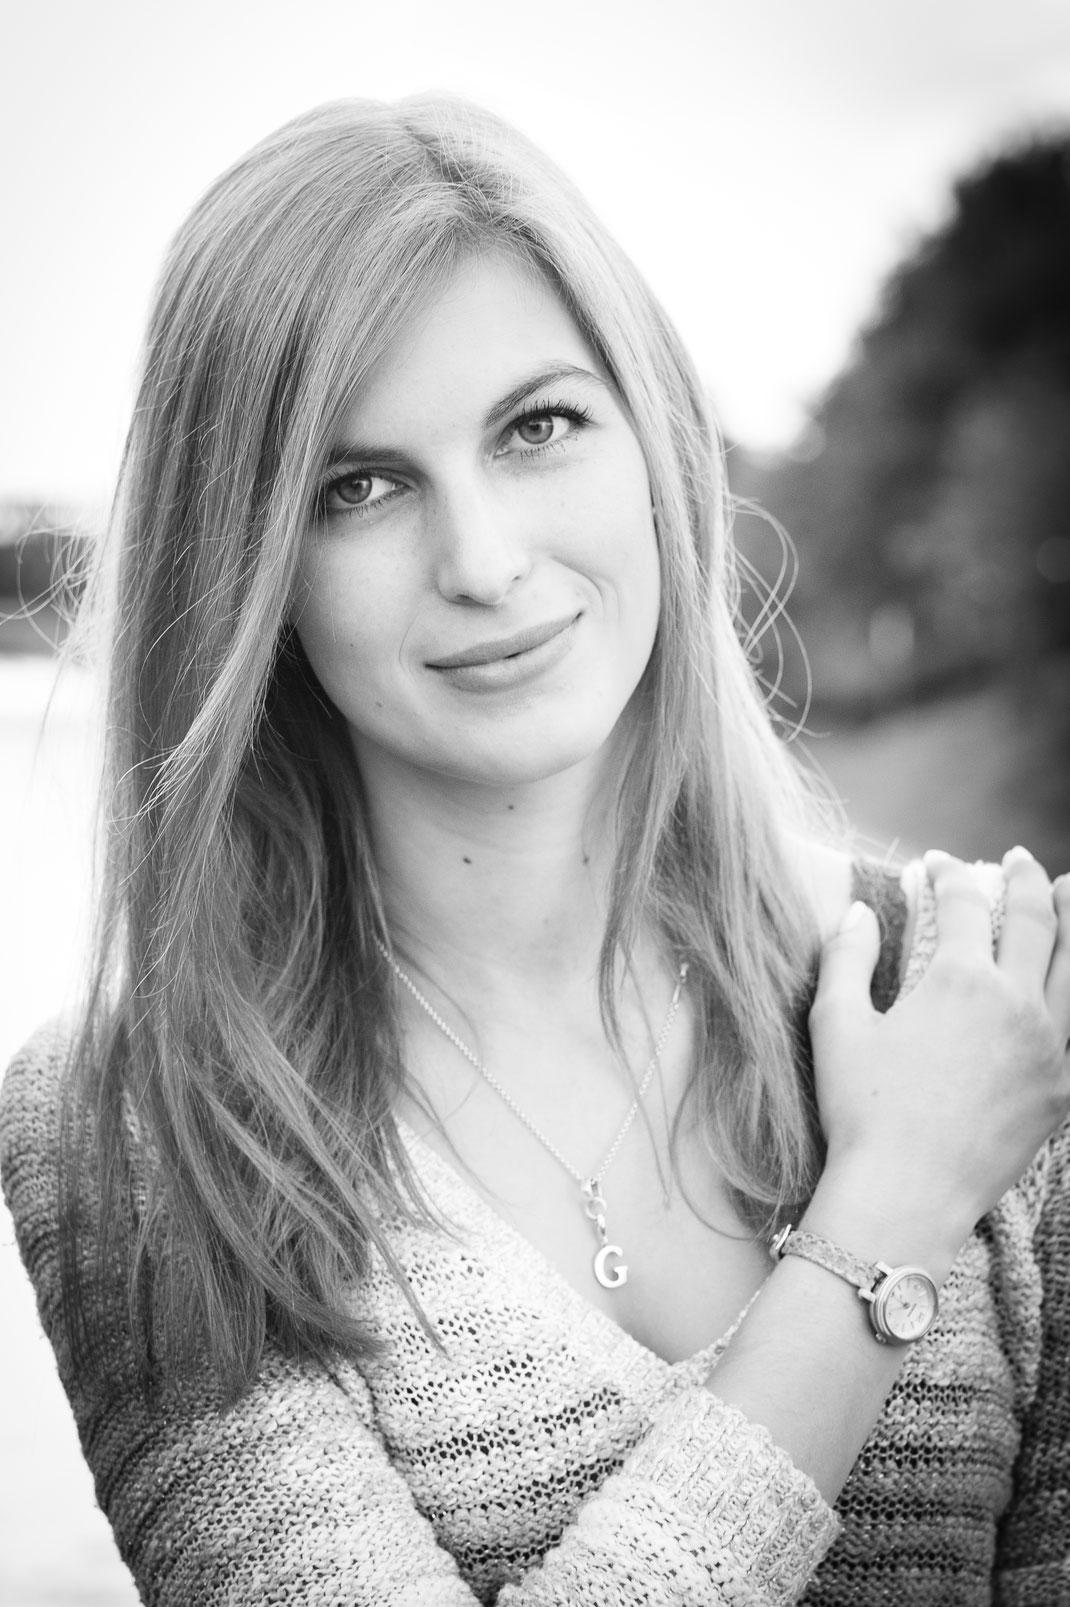 Junge Frau am Rhein Herne Kanal Oberhausen Portrait